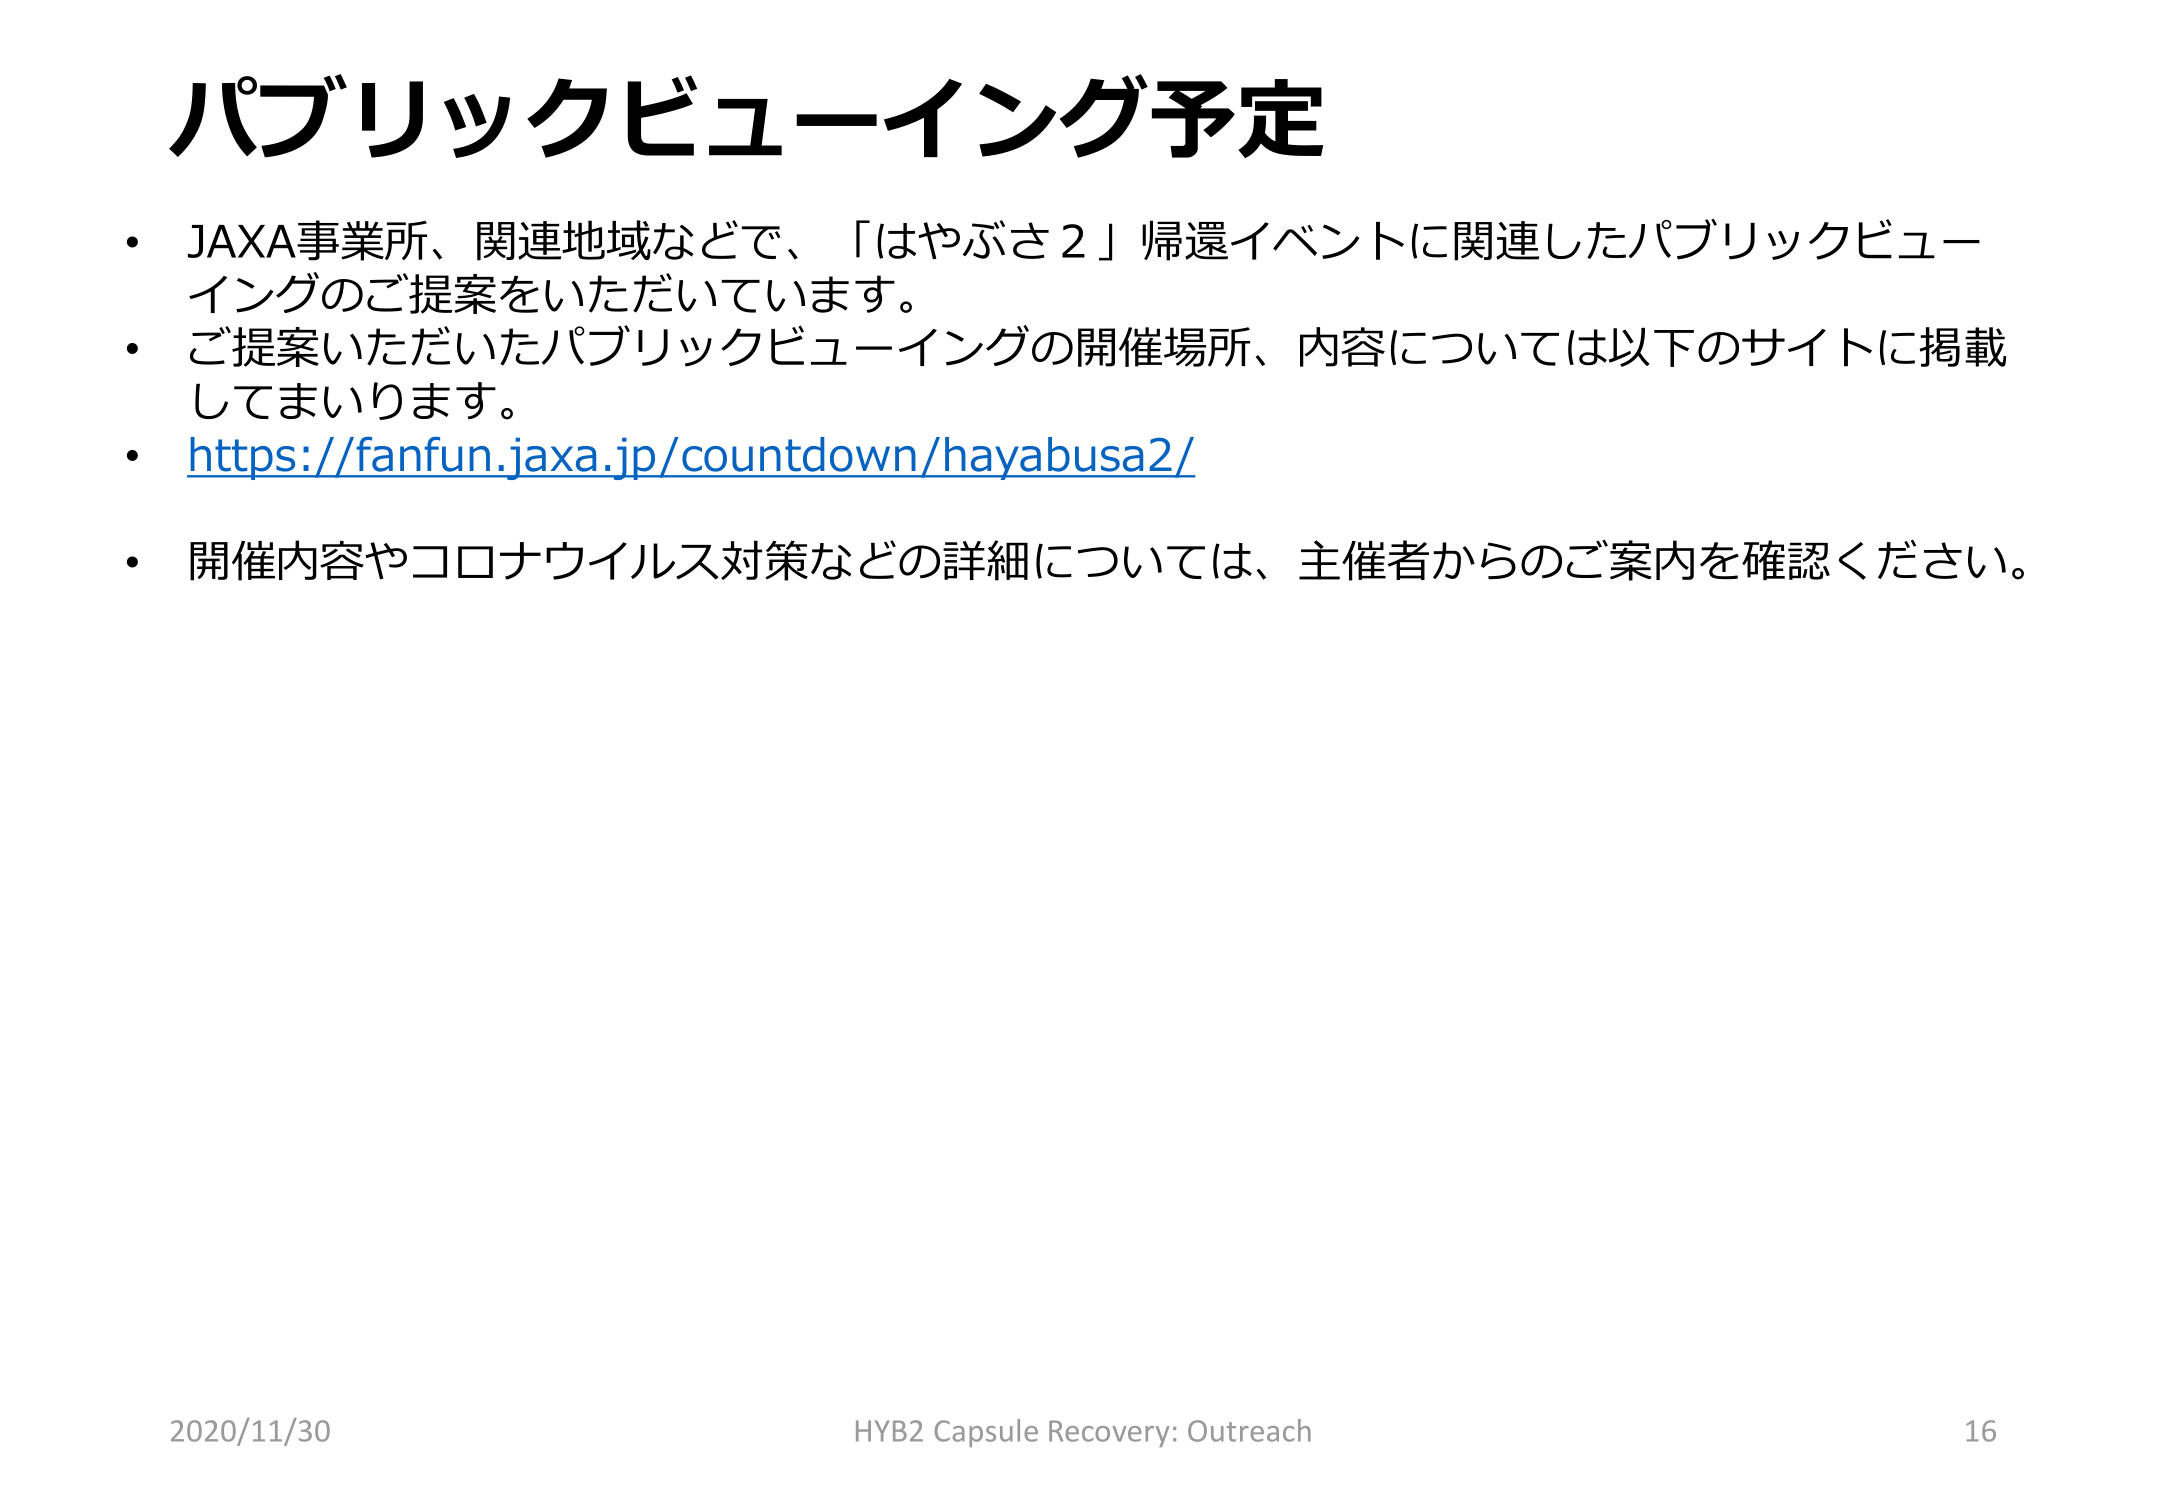 f:id:Imamura:20201130154501p:plain:h250